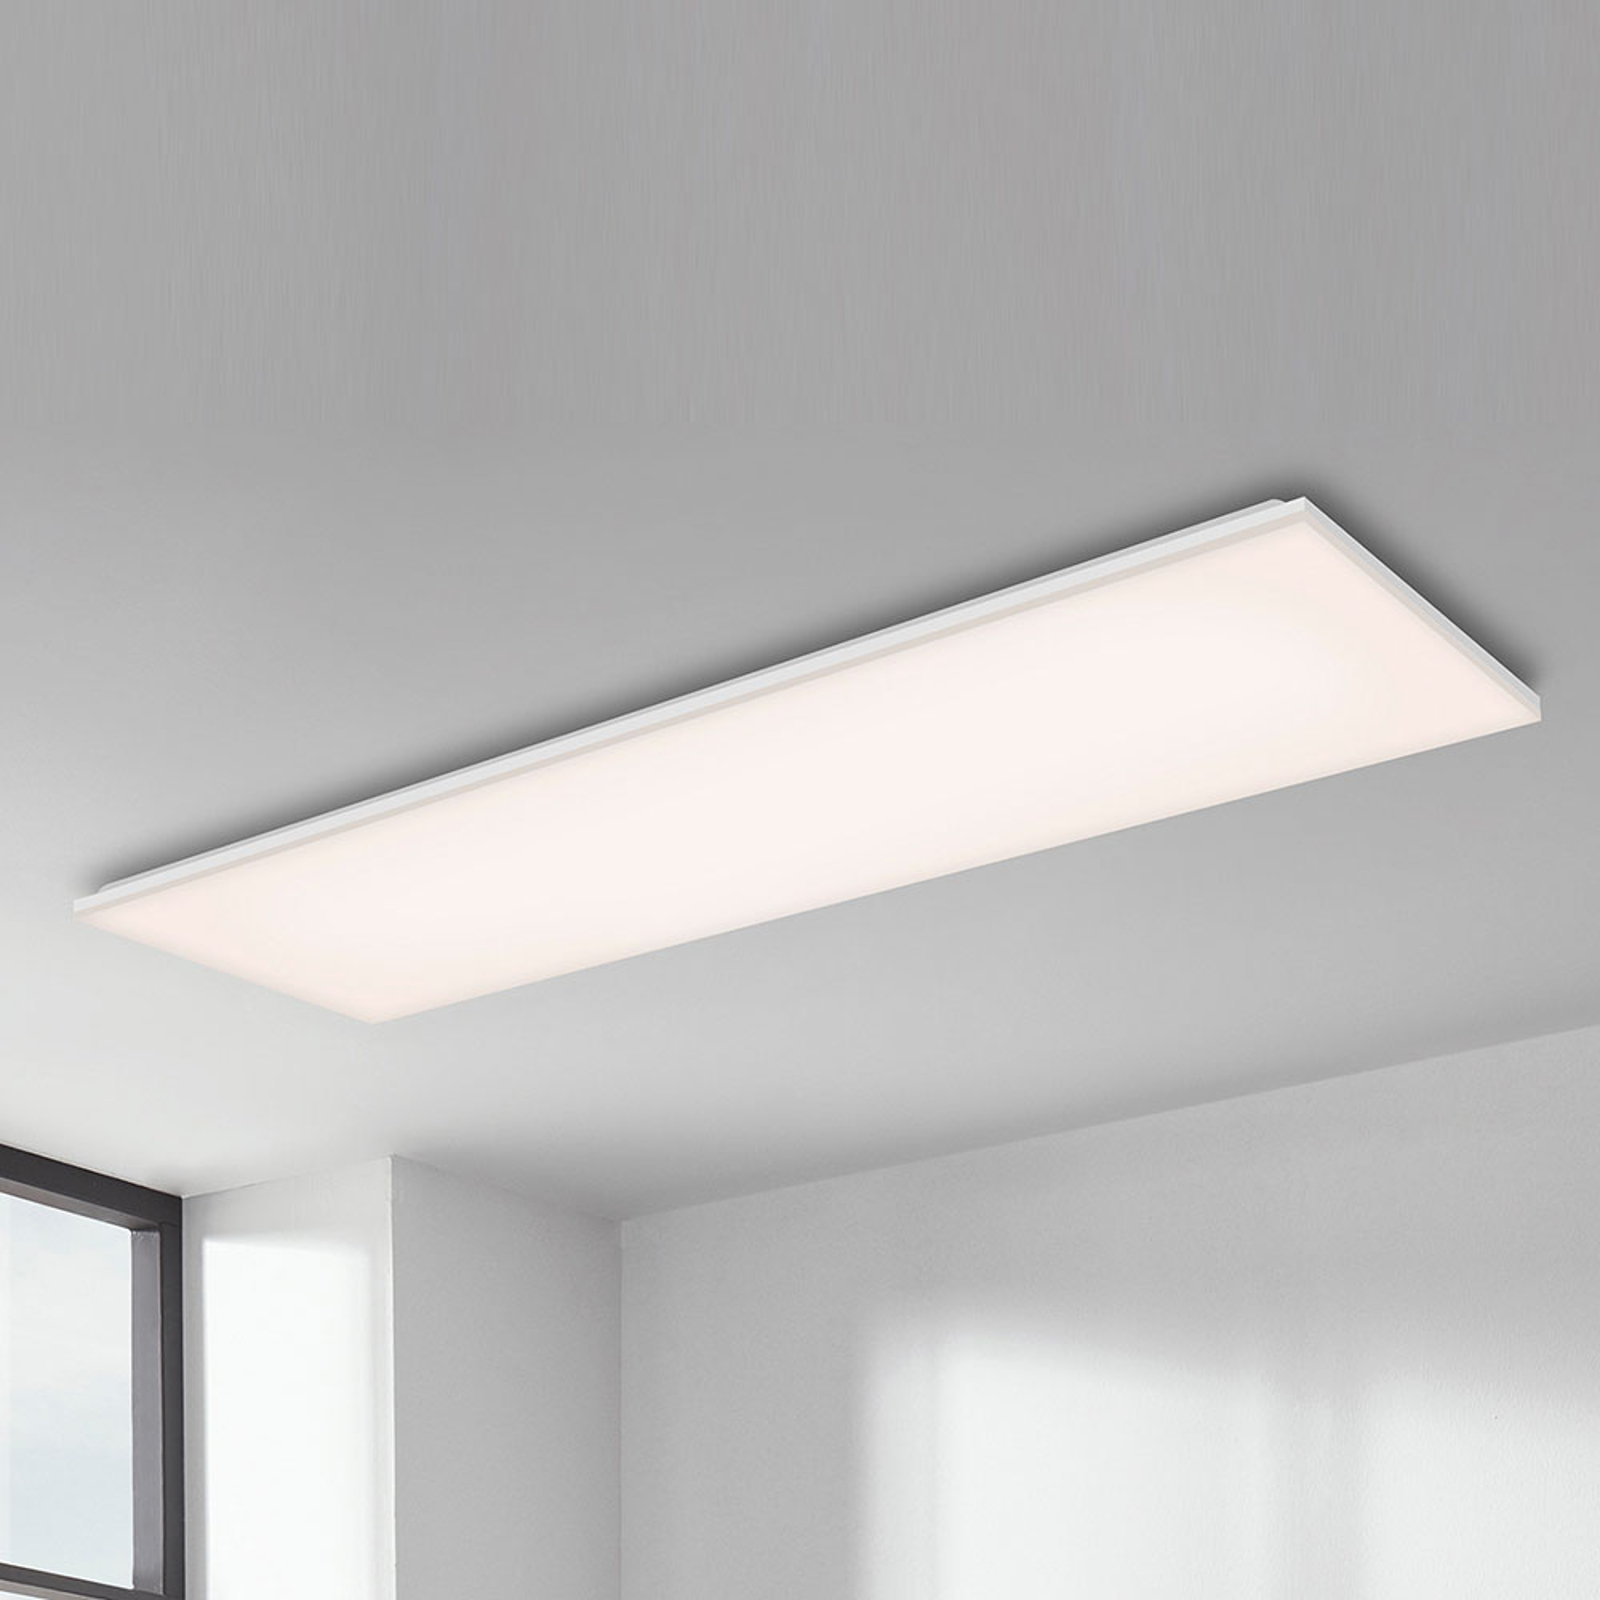 LED plafondlamp Frameless RGBW, 120x30cm